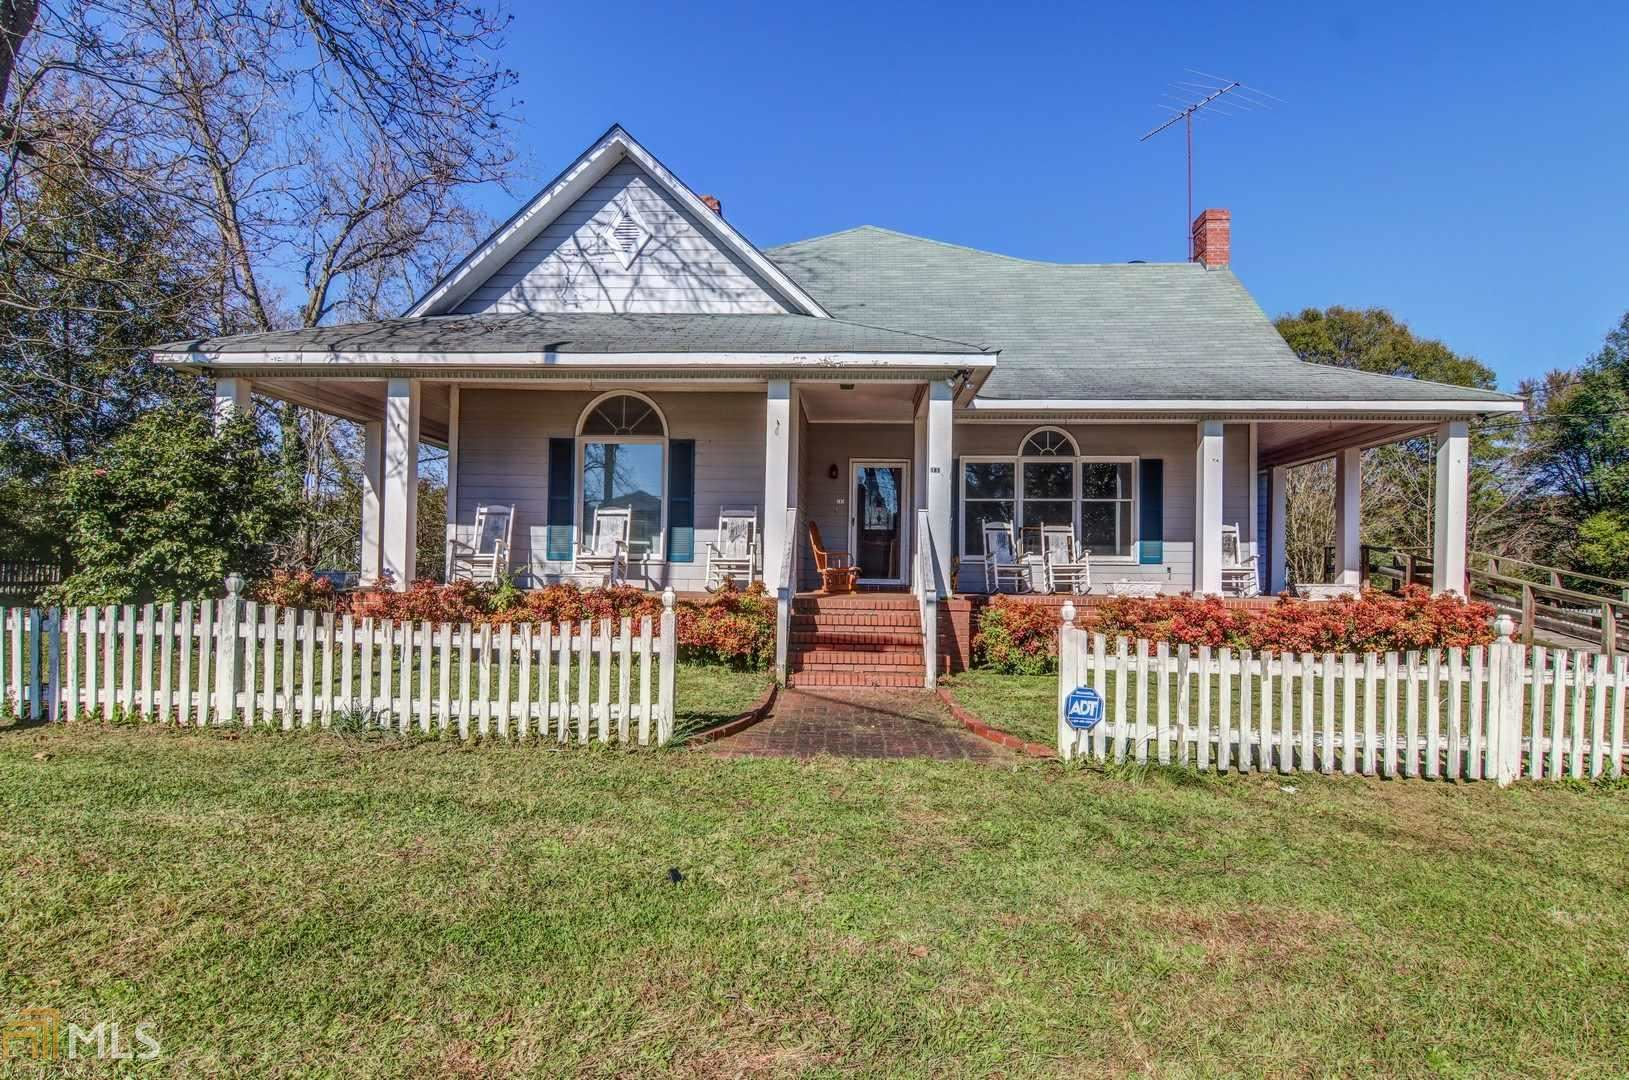 181 Lyons St, Jackson, GA 30233 - MLS#: 8895061